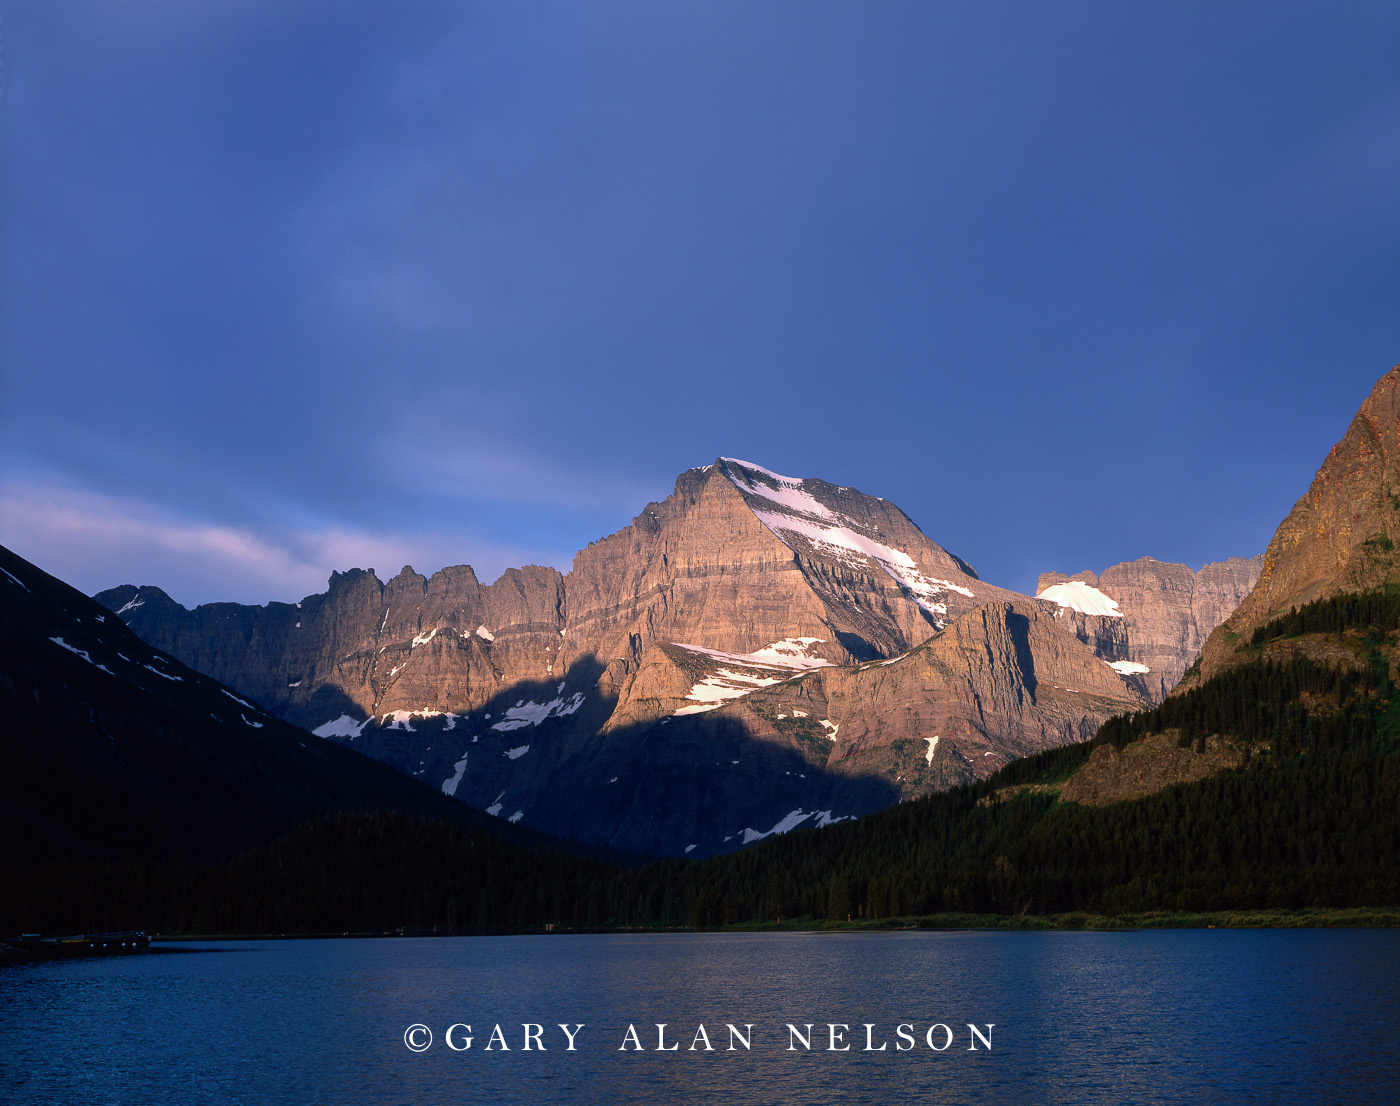 Glacier National Park, Montana, Swiftcurrent Lake, Mt. Gould, photo